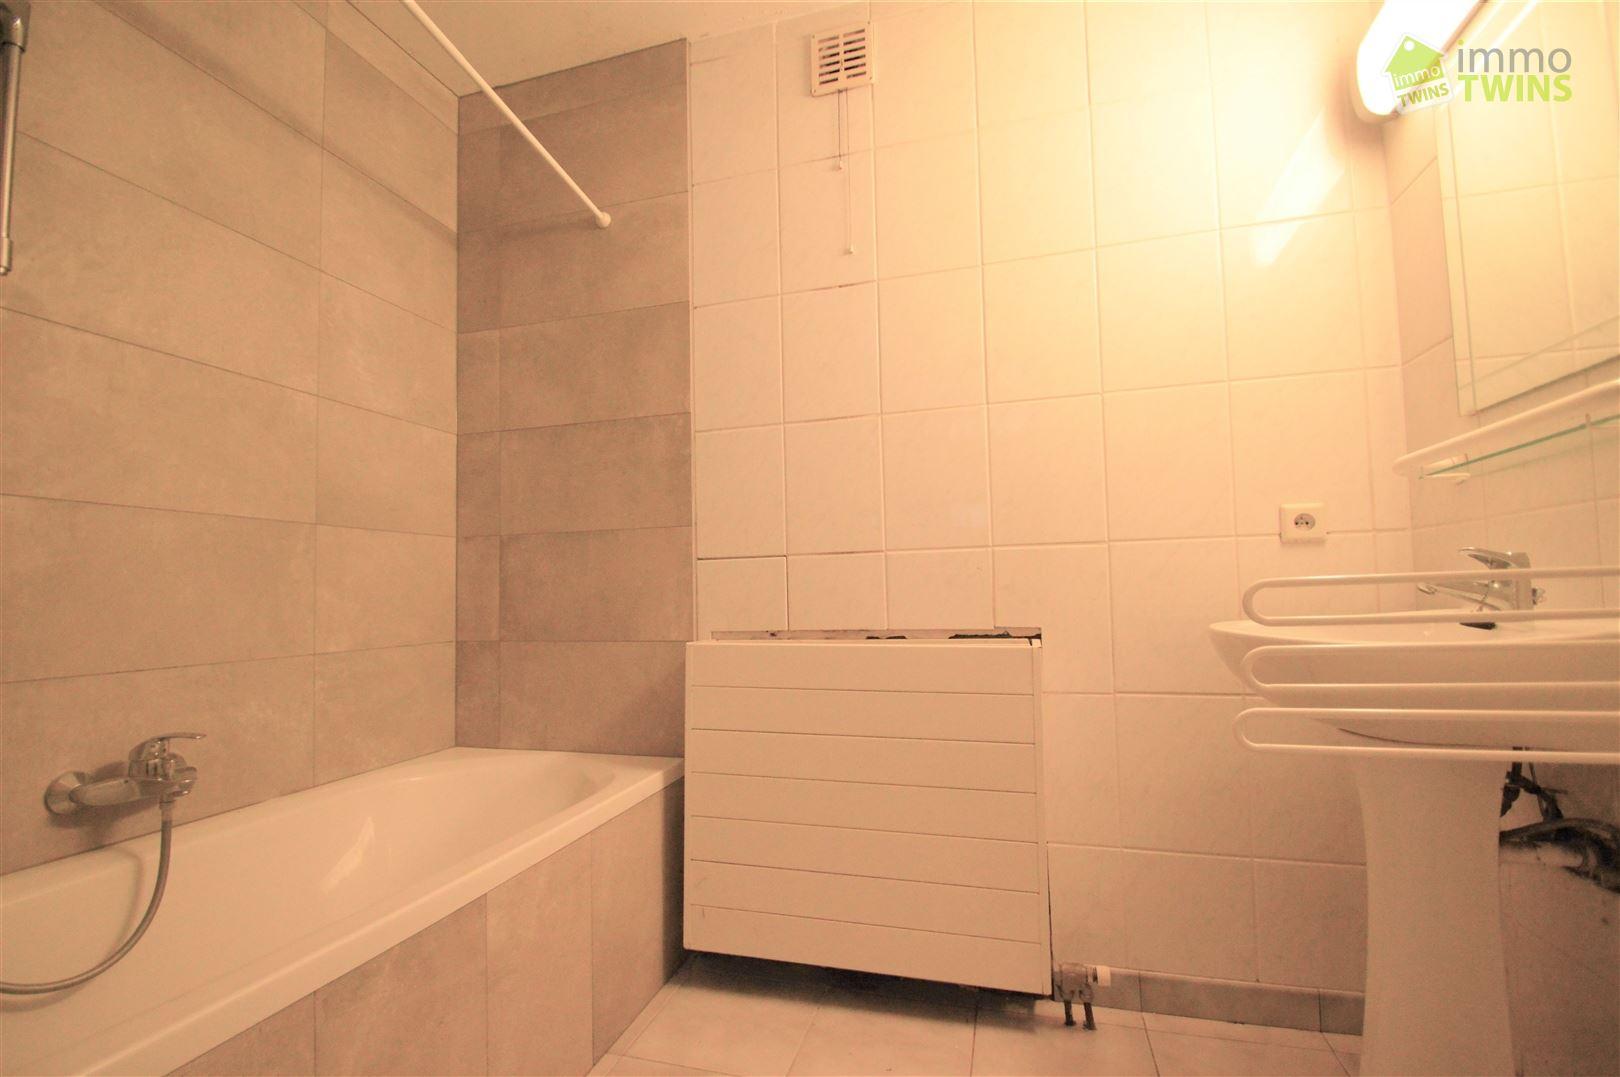 Foto 7 : Appartement te 9200 SINT-GILLIS-DENDERMONDE (België) - Prijs € 535